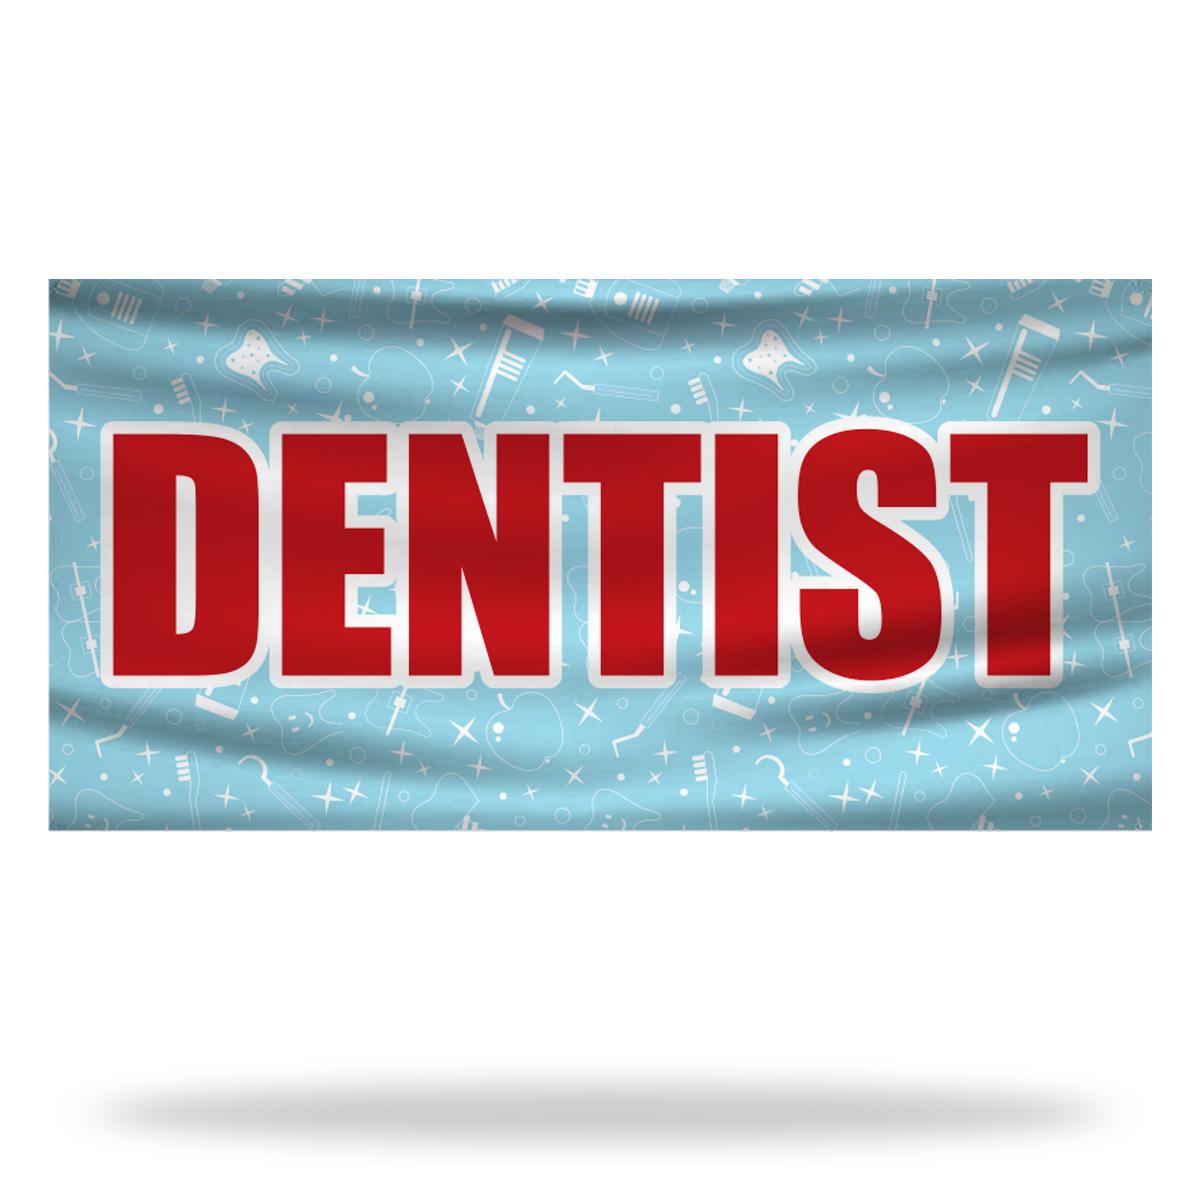 Dentist Flags & Banners Design 02